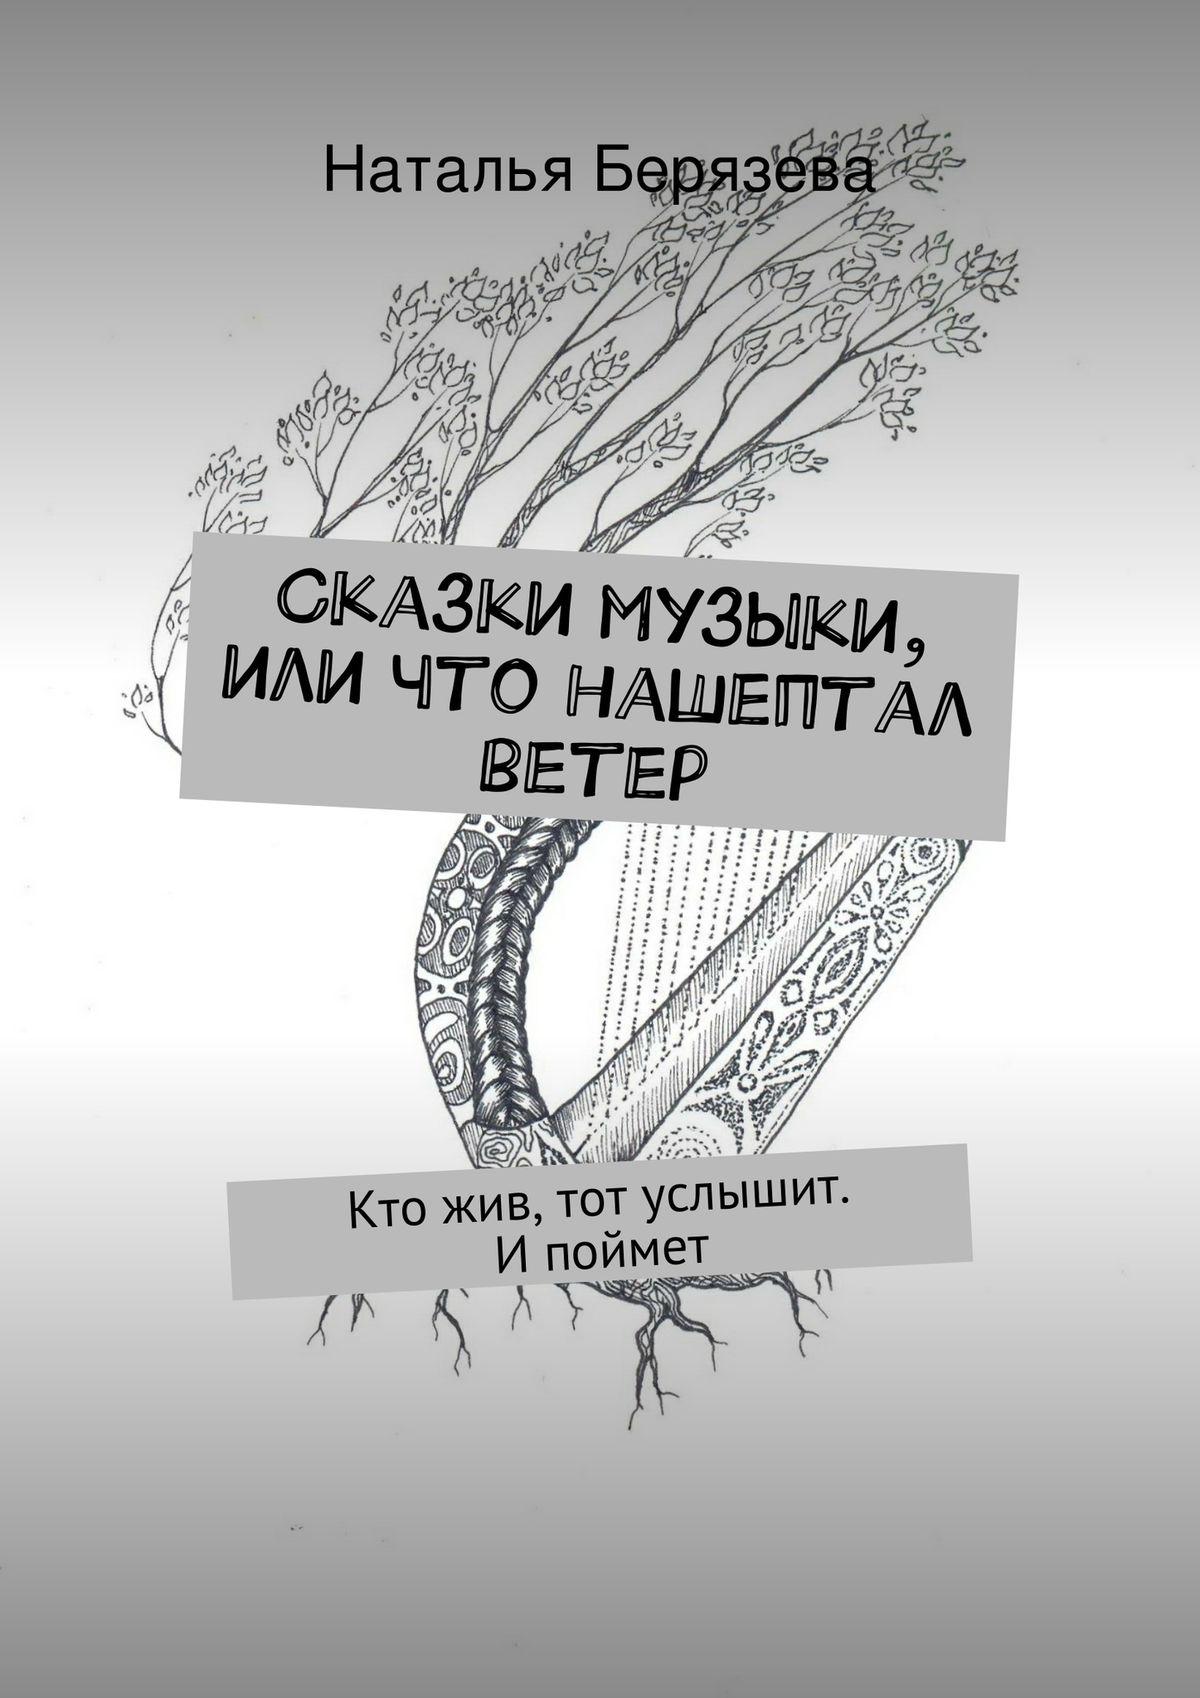 Наталья Александровна Берязева Сказки музыки, или Что нашептал ветер цена и фото